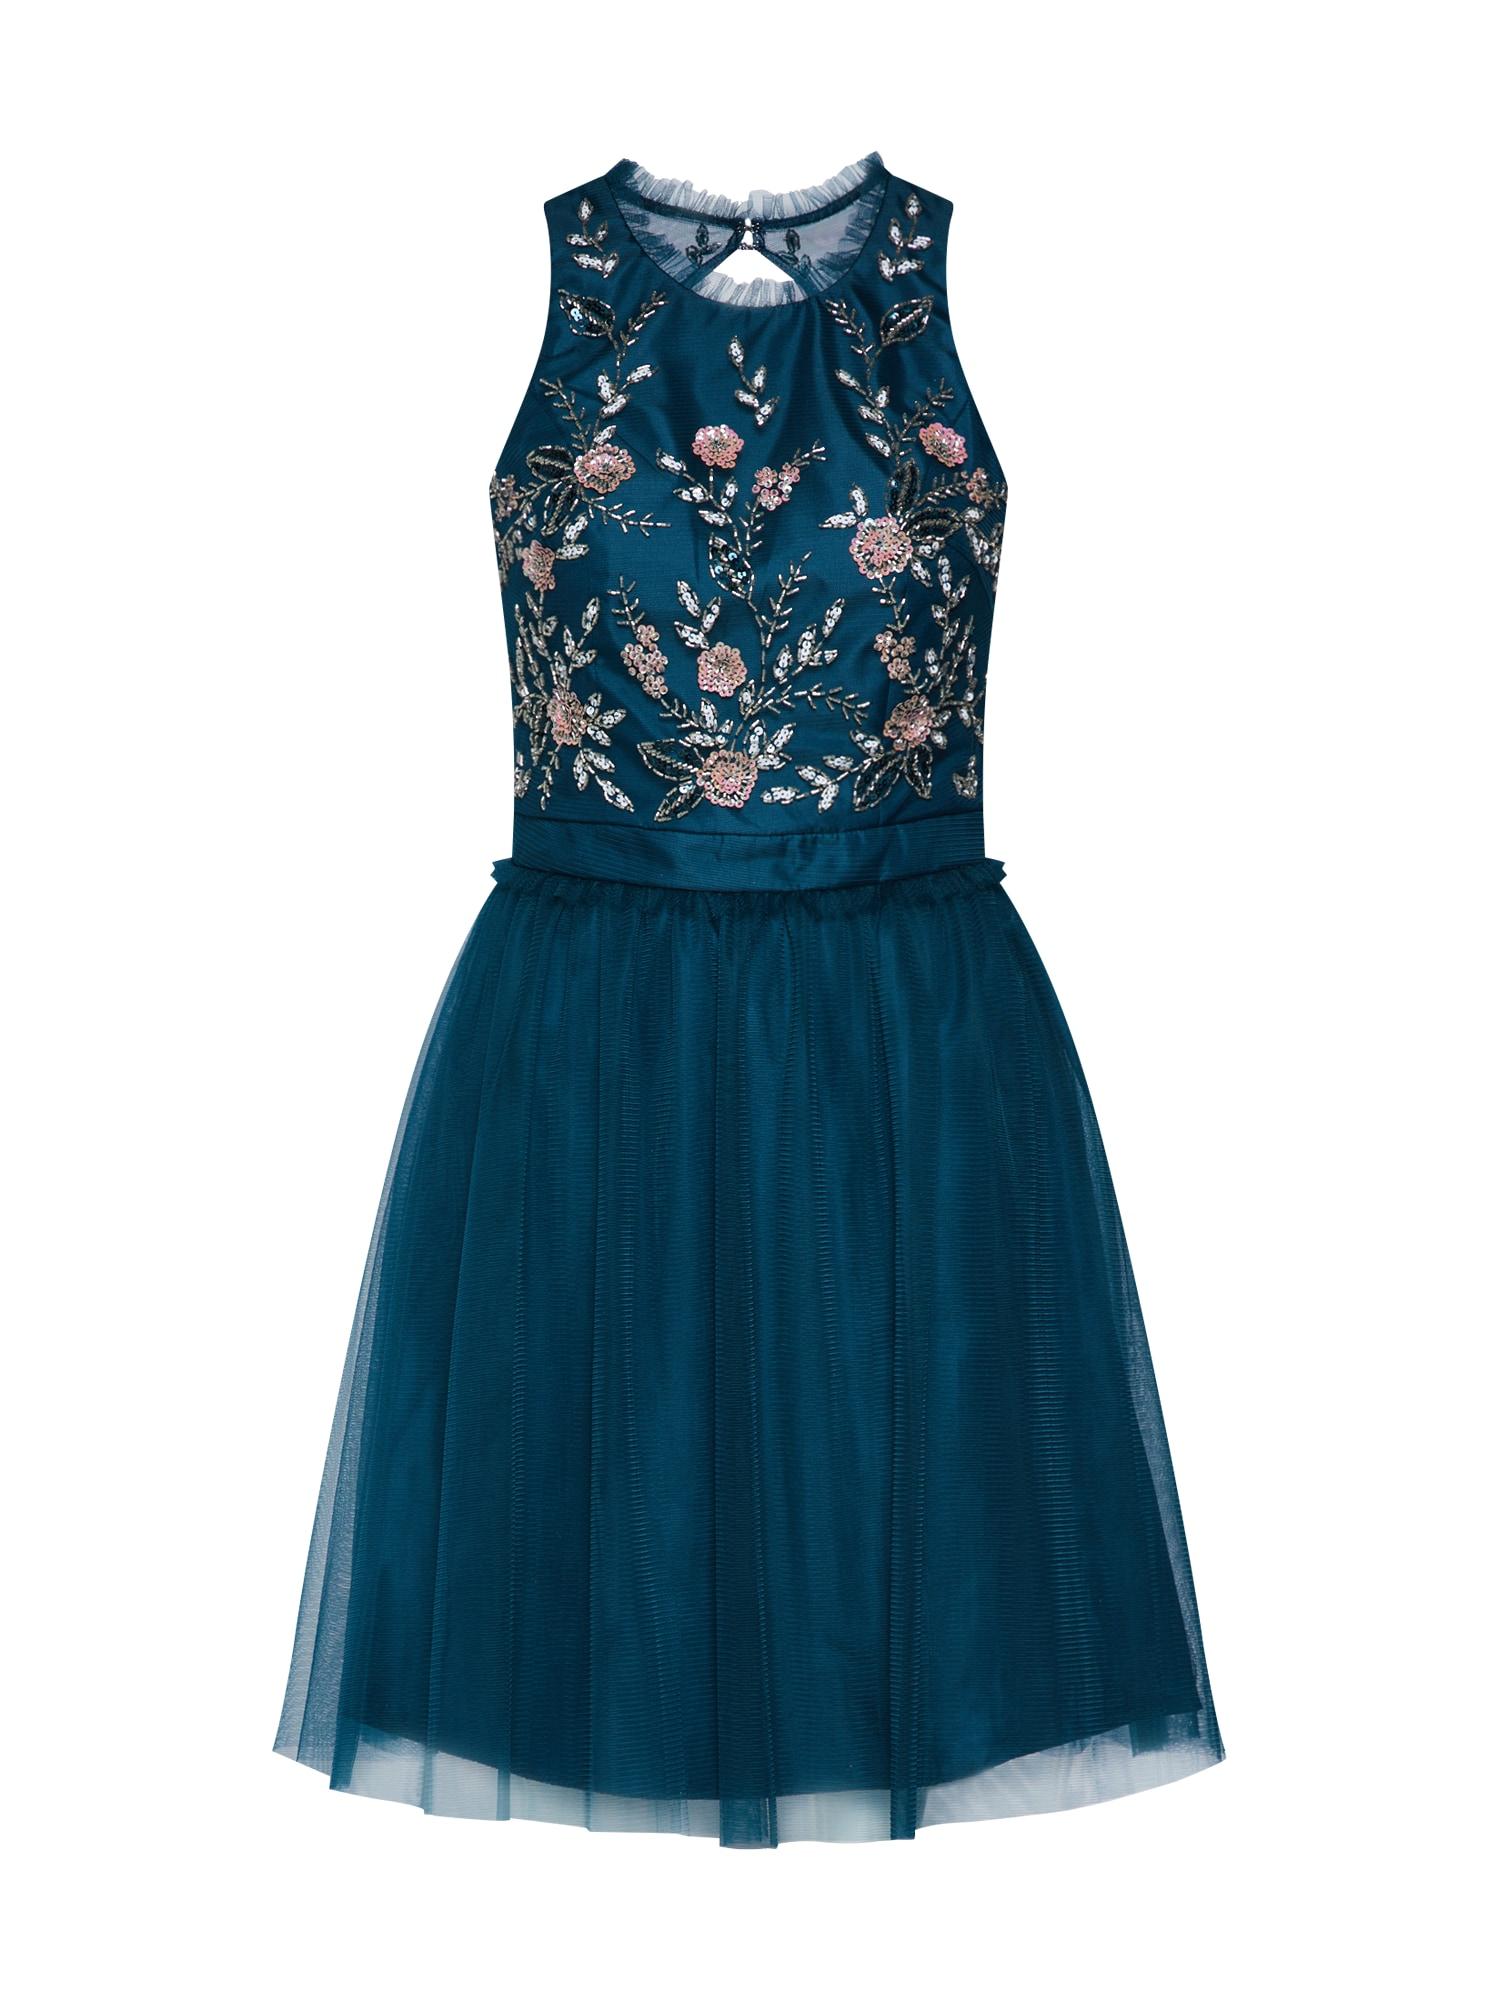 Šaty tmavě modrá mix barev Laona